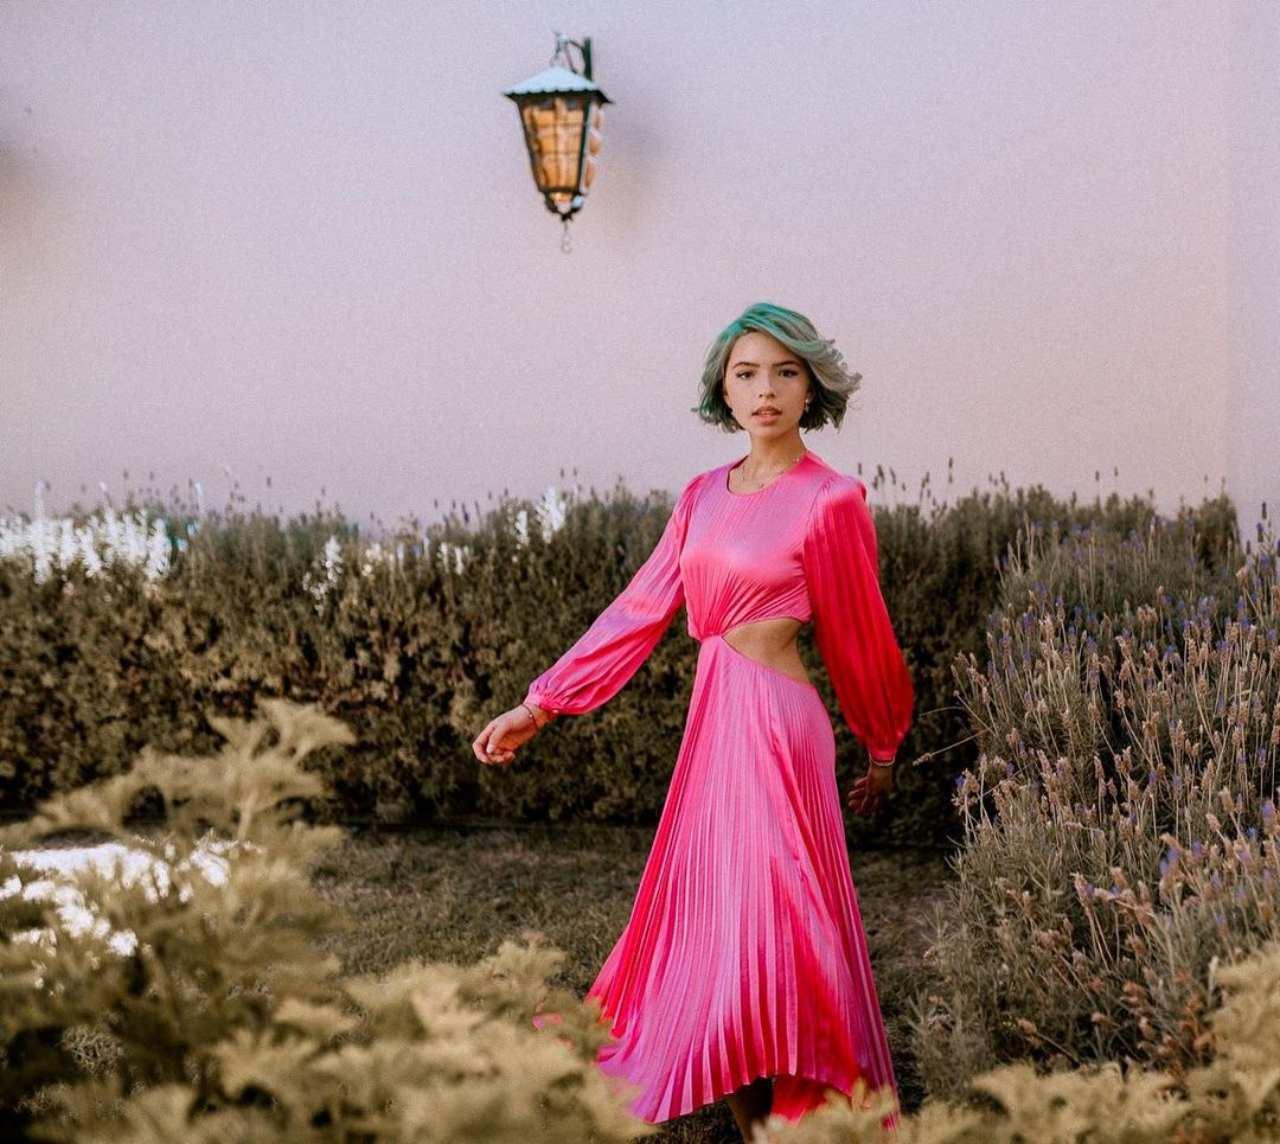 menor dinastia aguilar vestido rosa mexicano